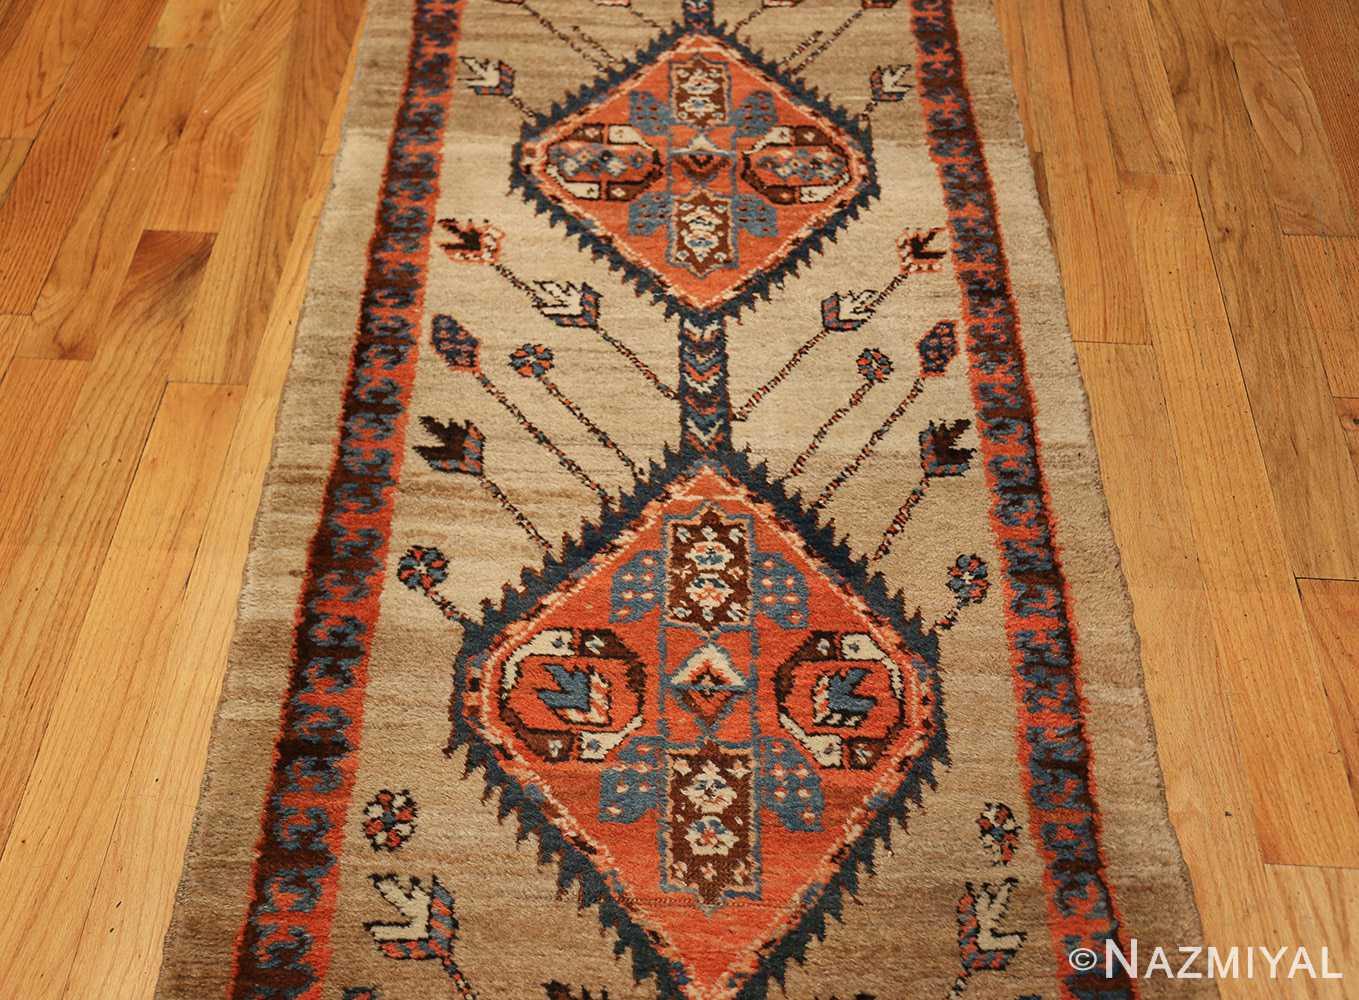 camel hair antique bakshaish runner rug 49277 medallions Nazmiyal